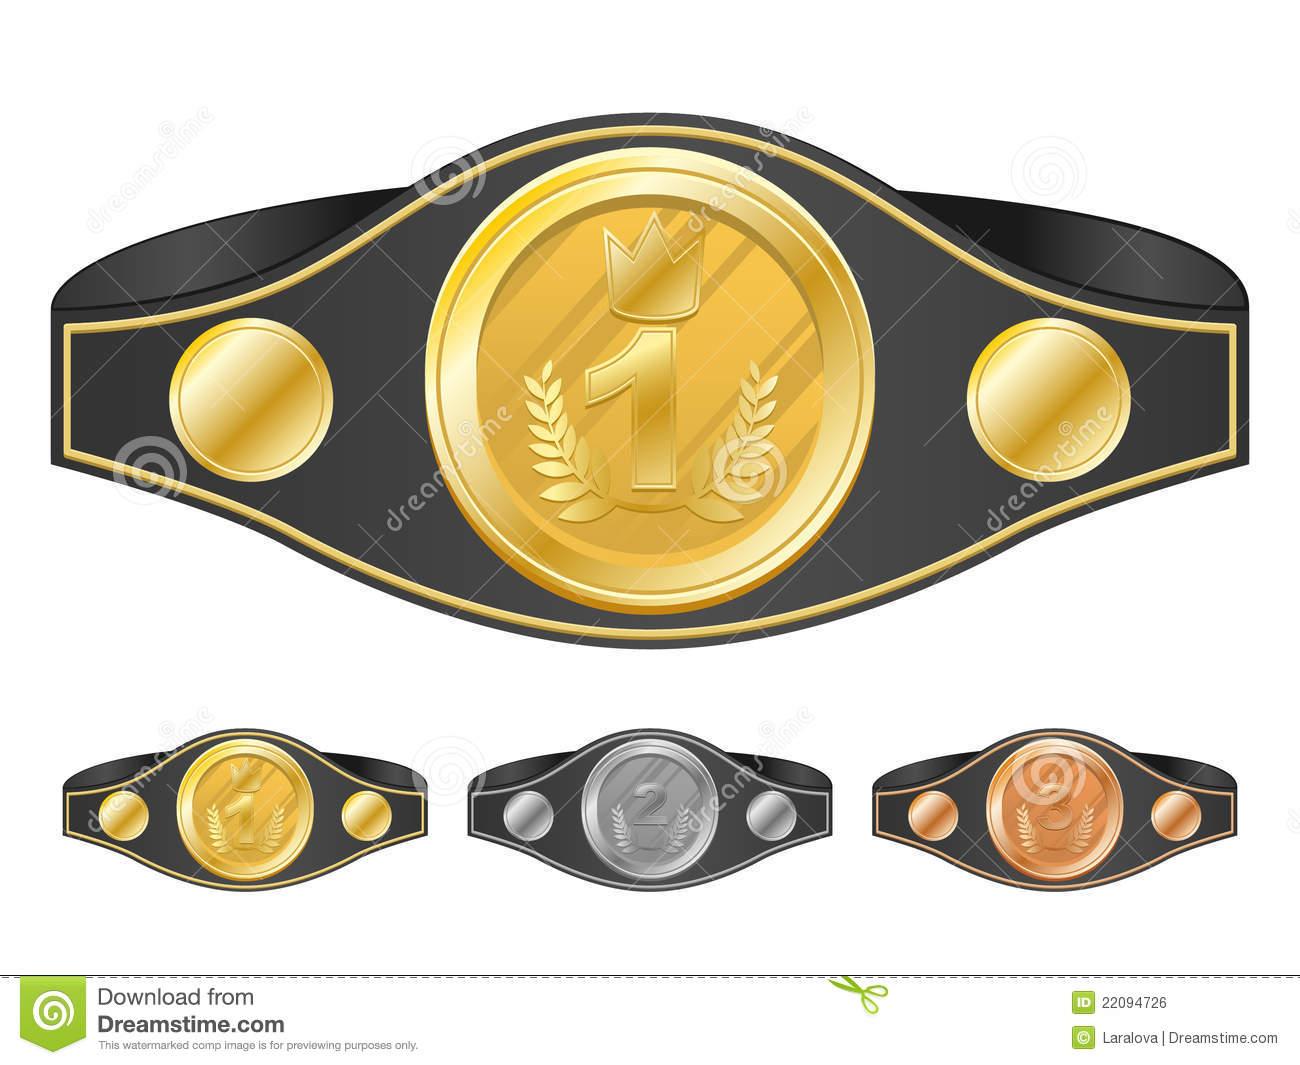 Championship belt clipart.